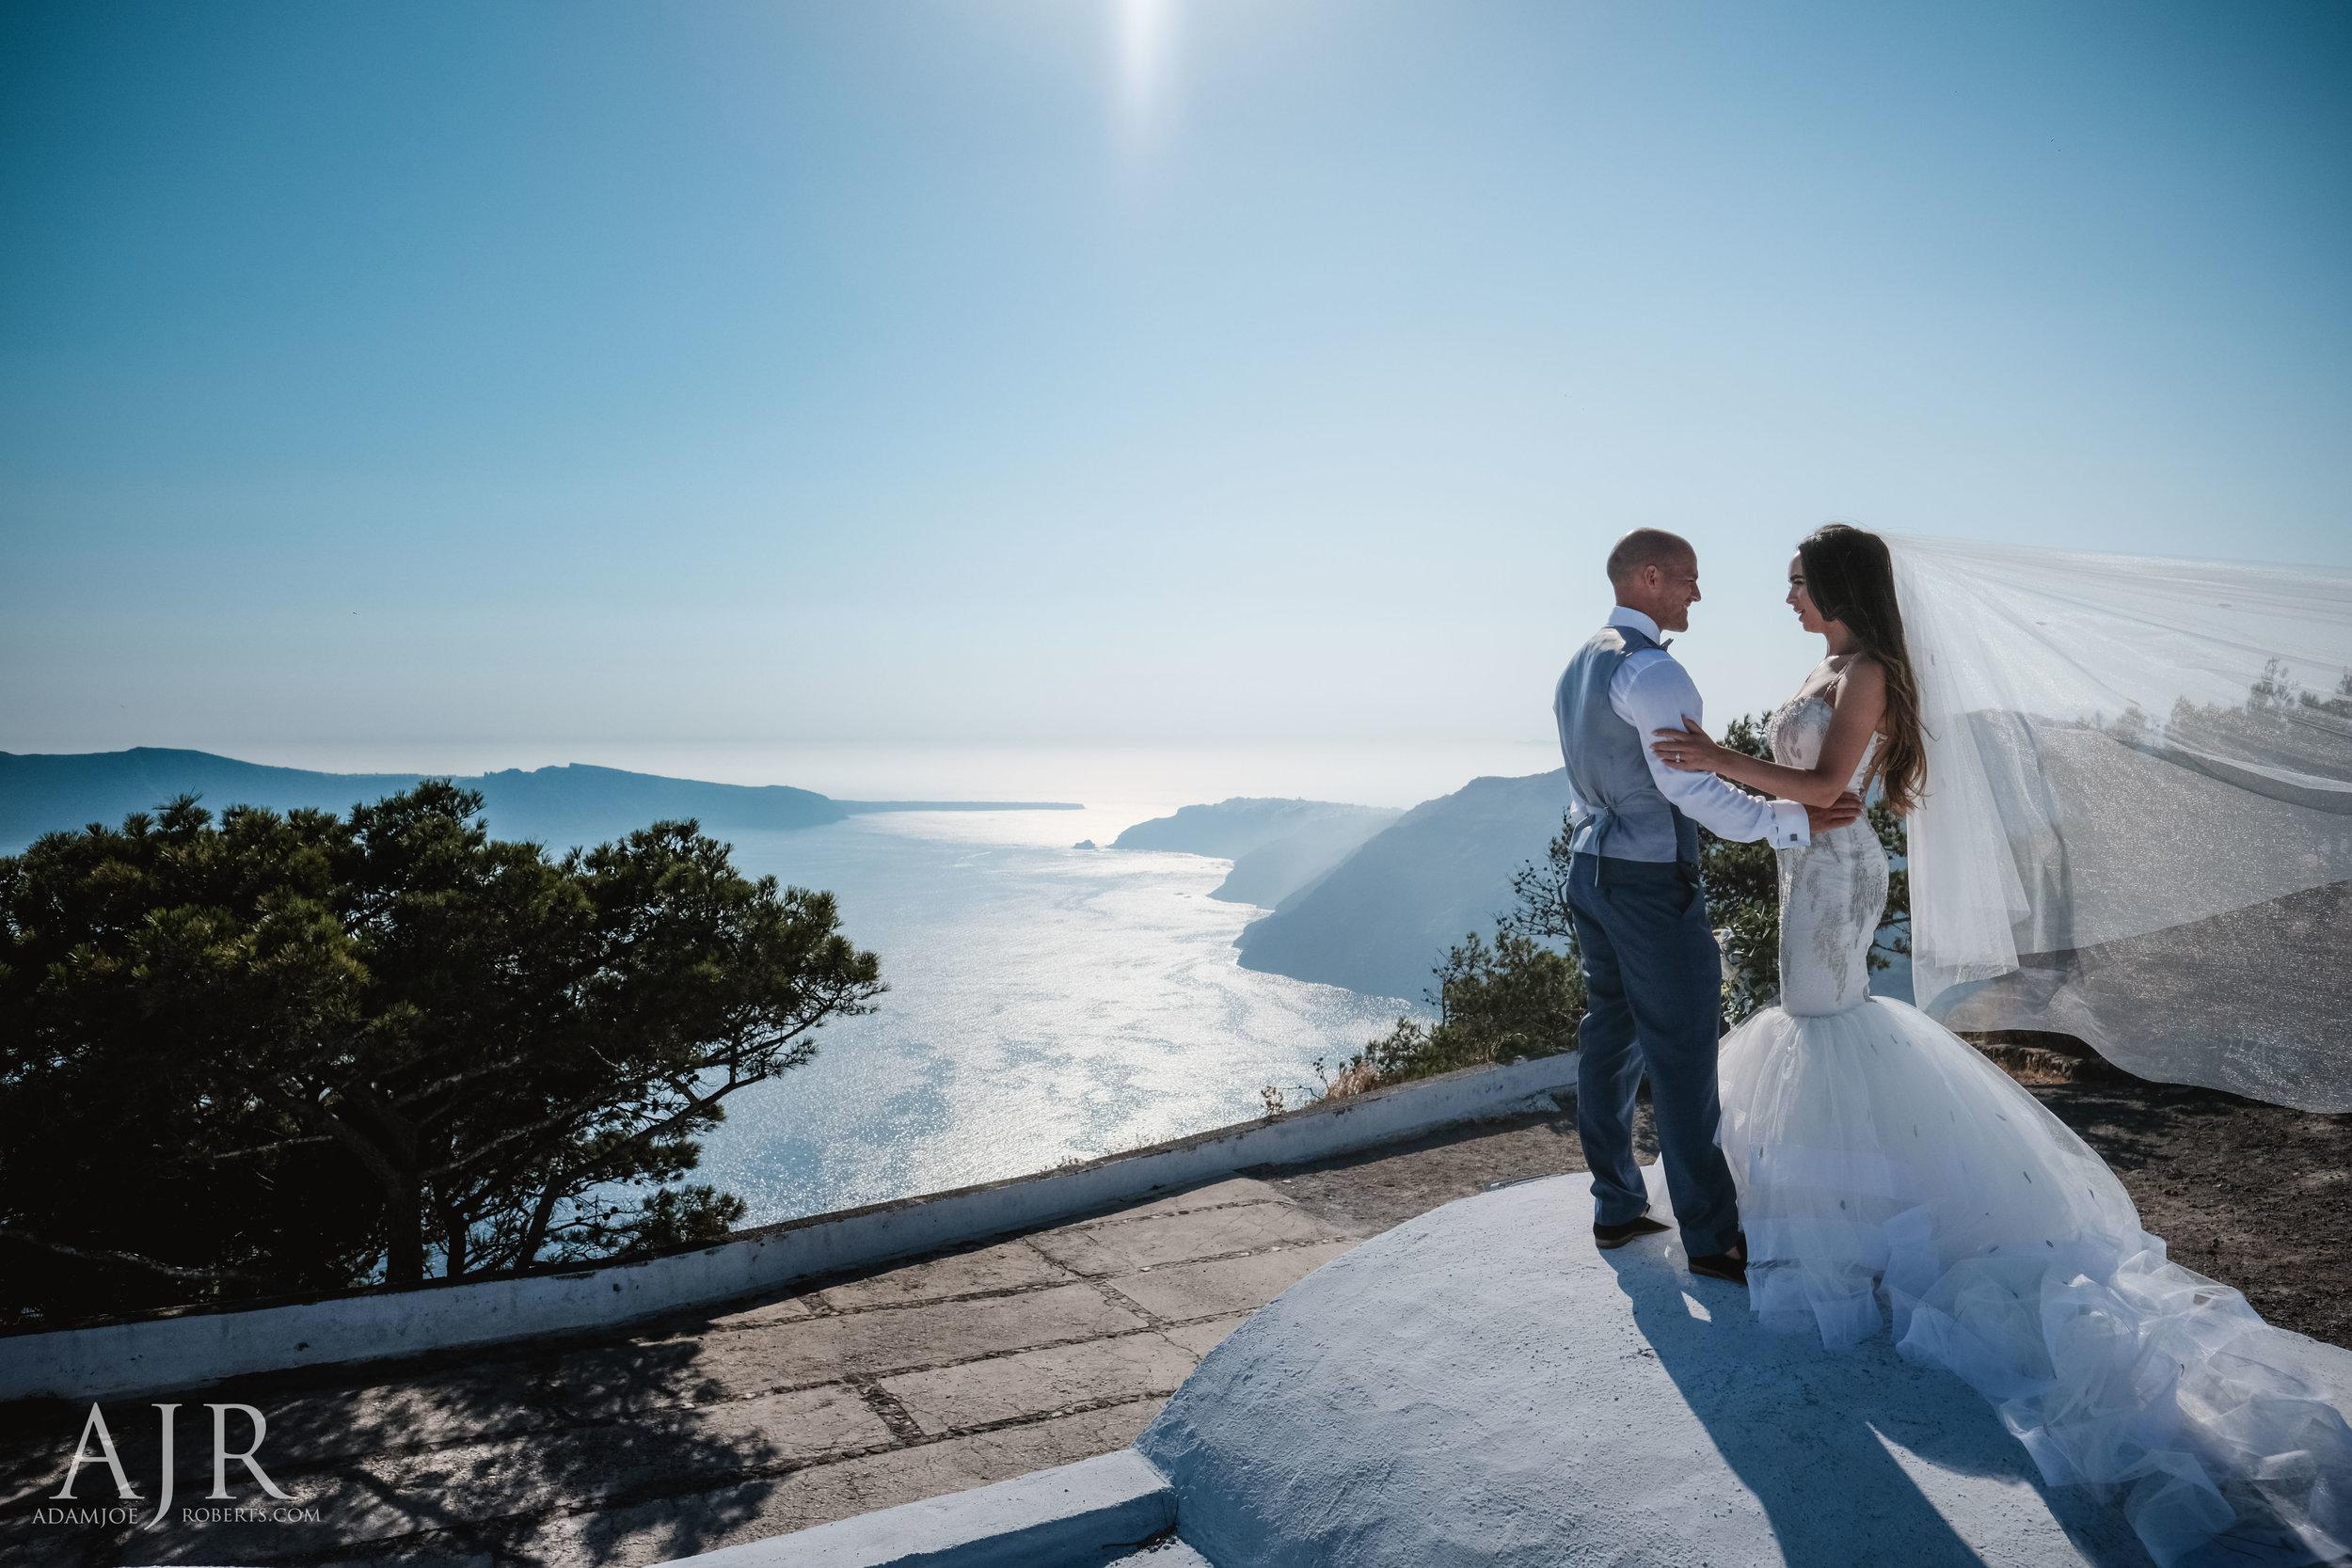 Mollie and Antony Le Ciel Santorini Destination Wedding - Sneak Peek (7 of 15).jpg